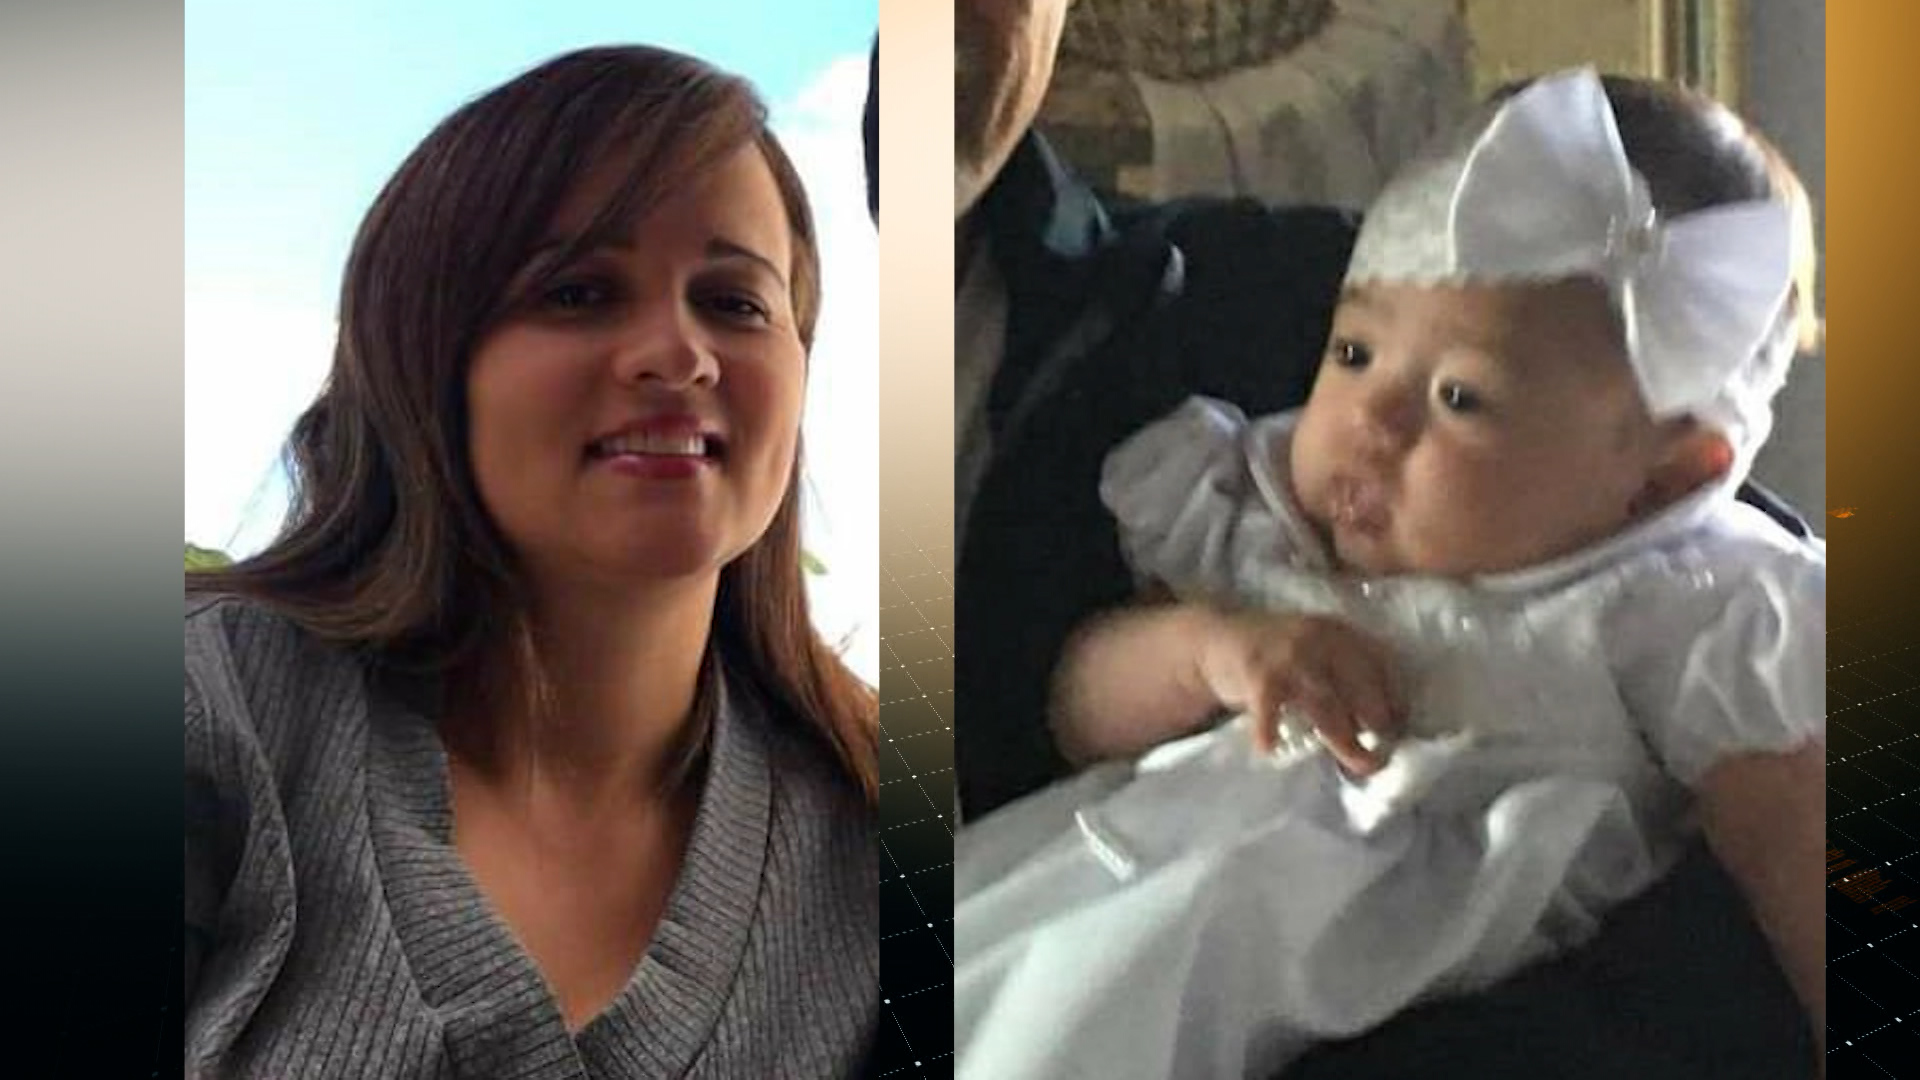 Avó de bebê que foi morta pela mãe também é indiciada